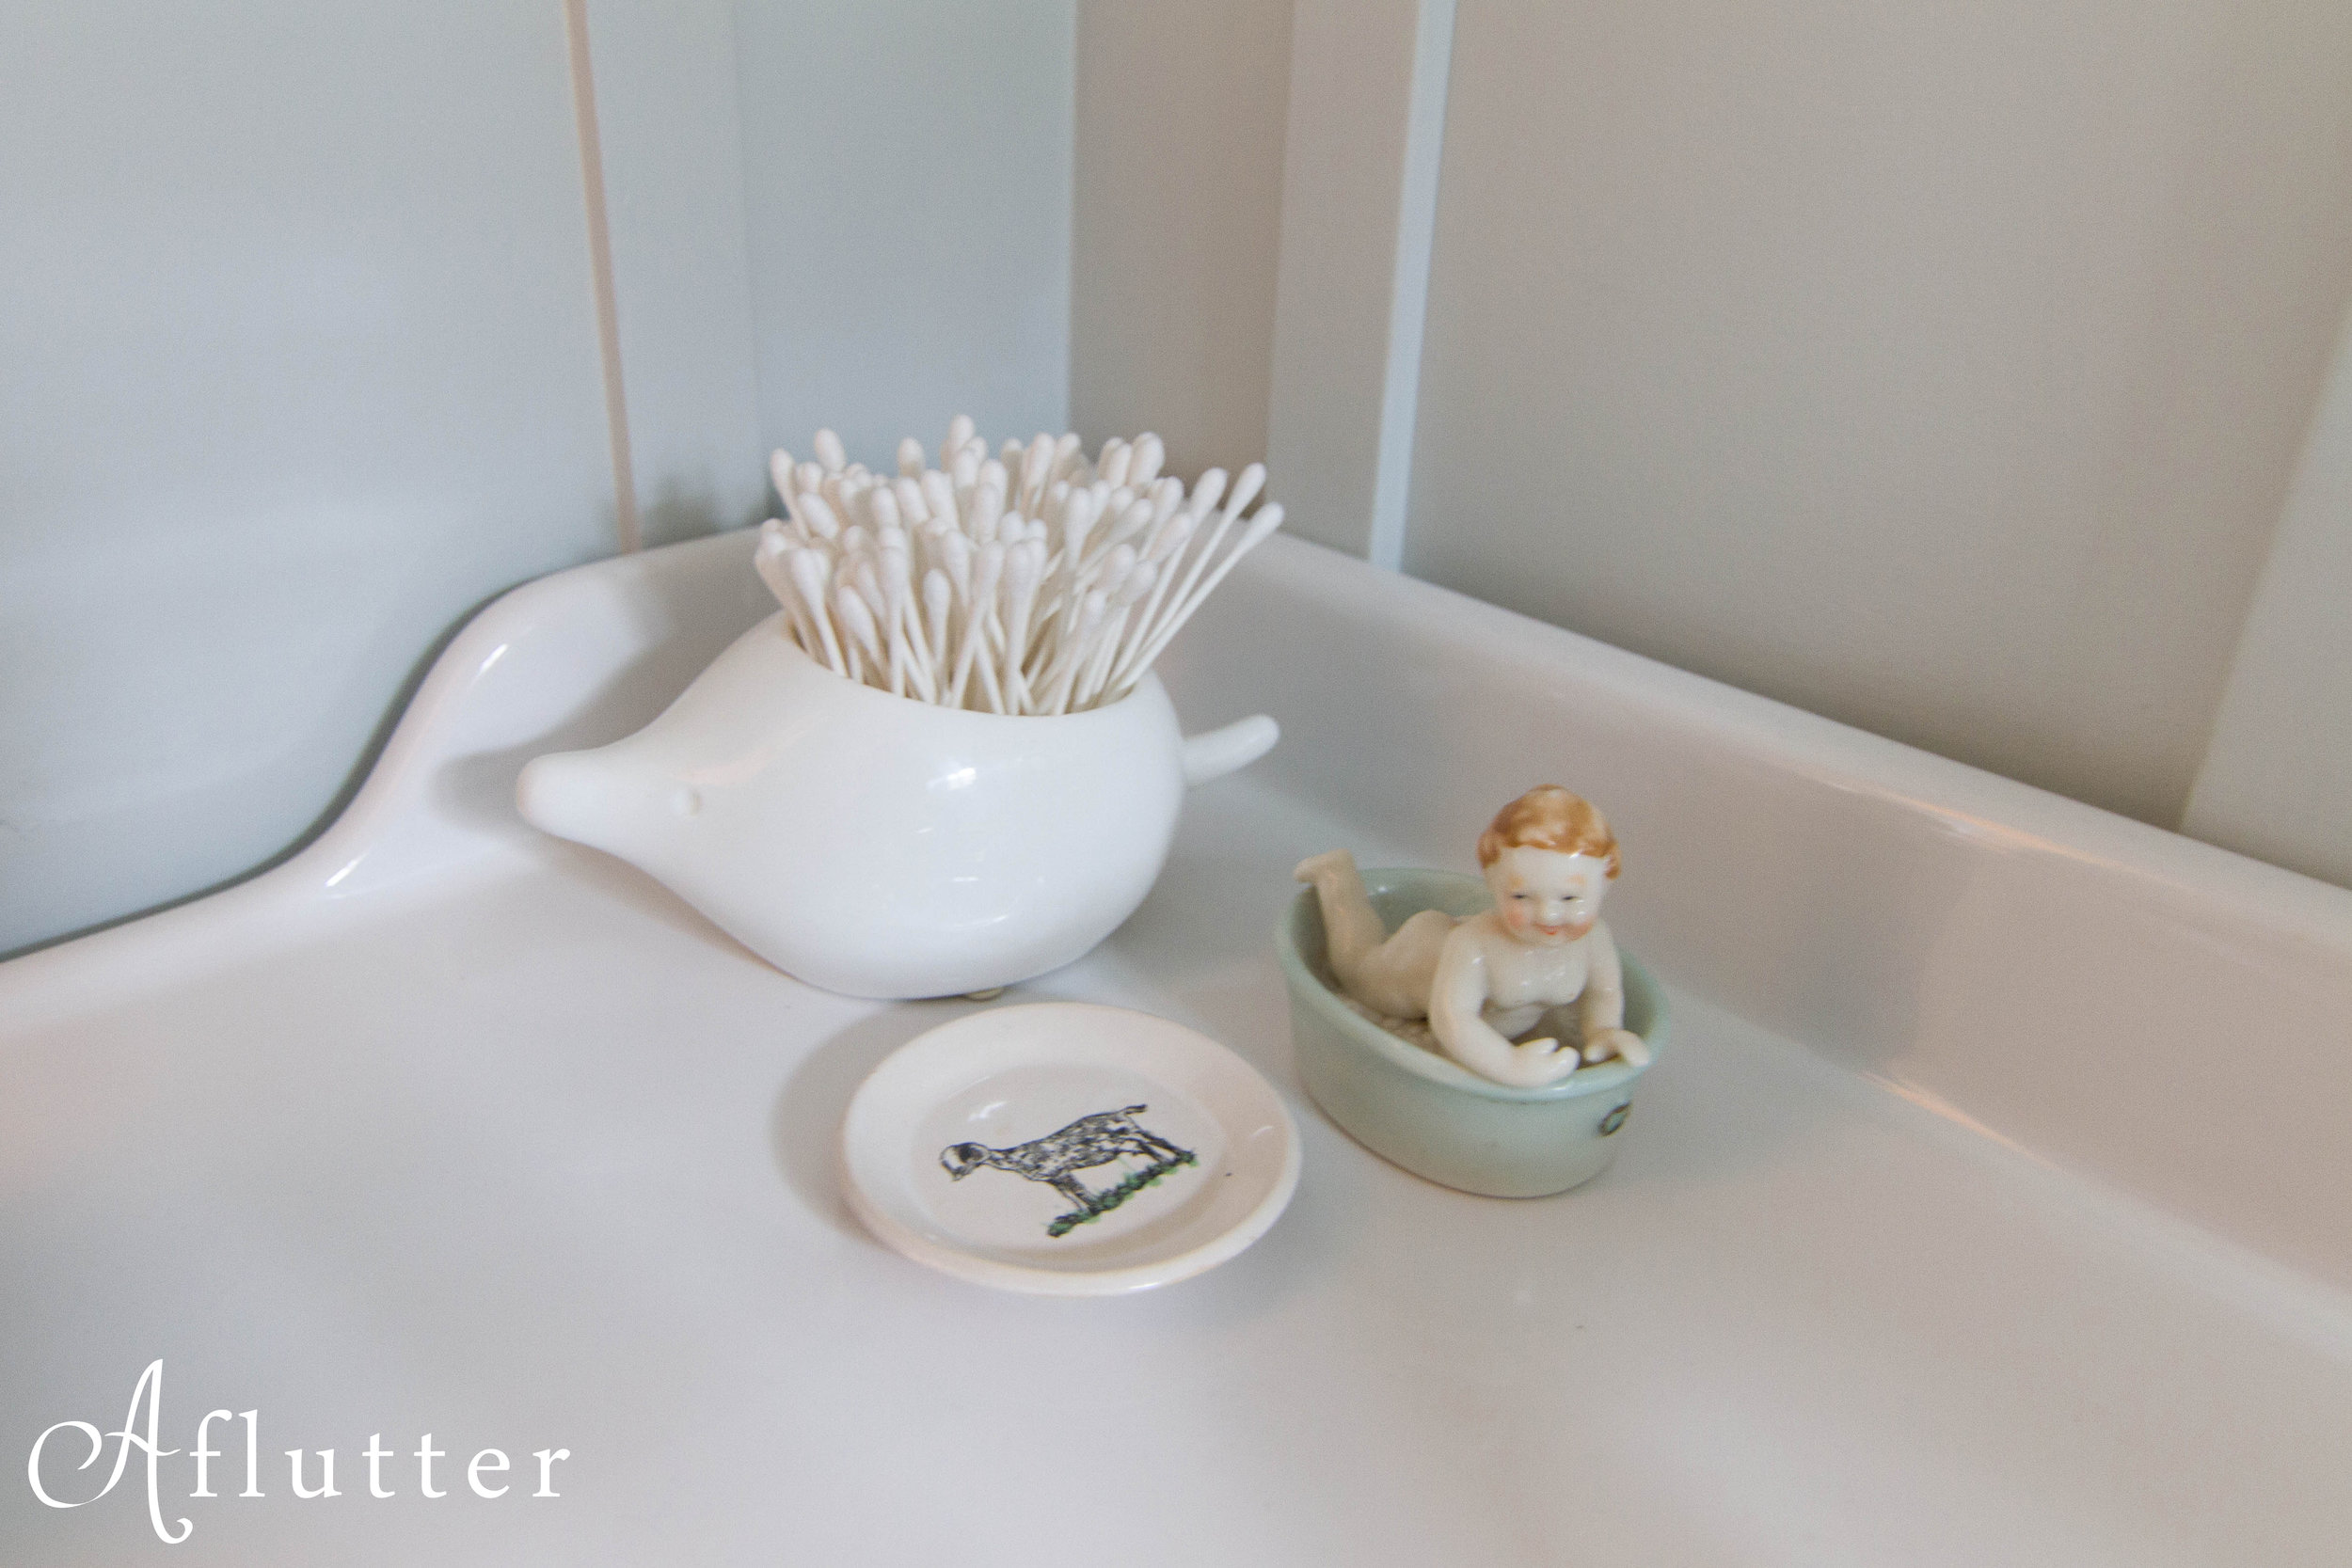 Bath-Remodel-13-of-3.jpg